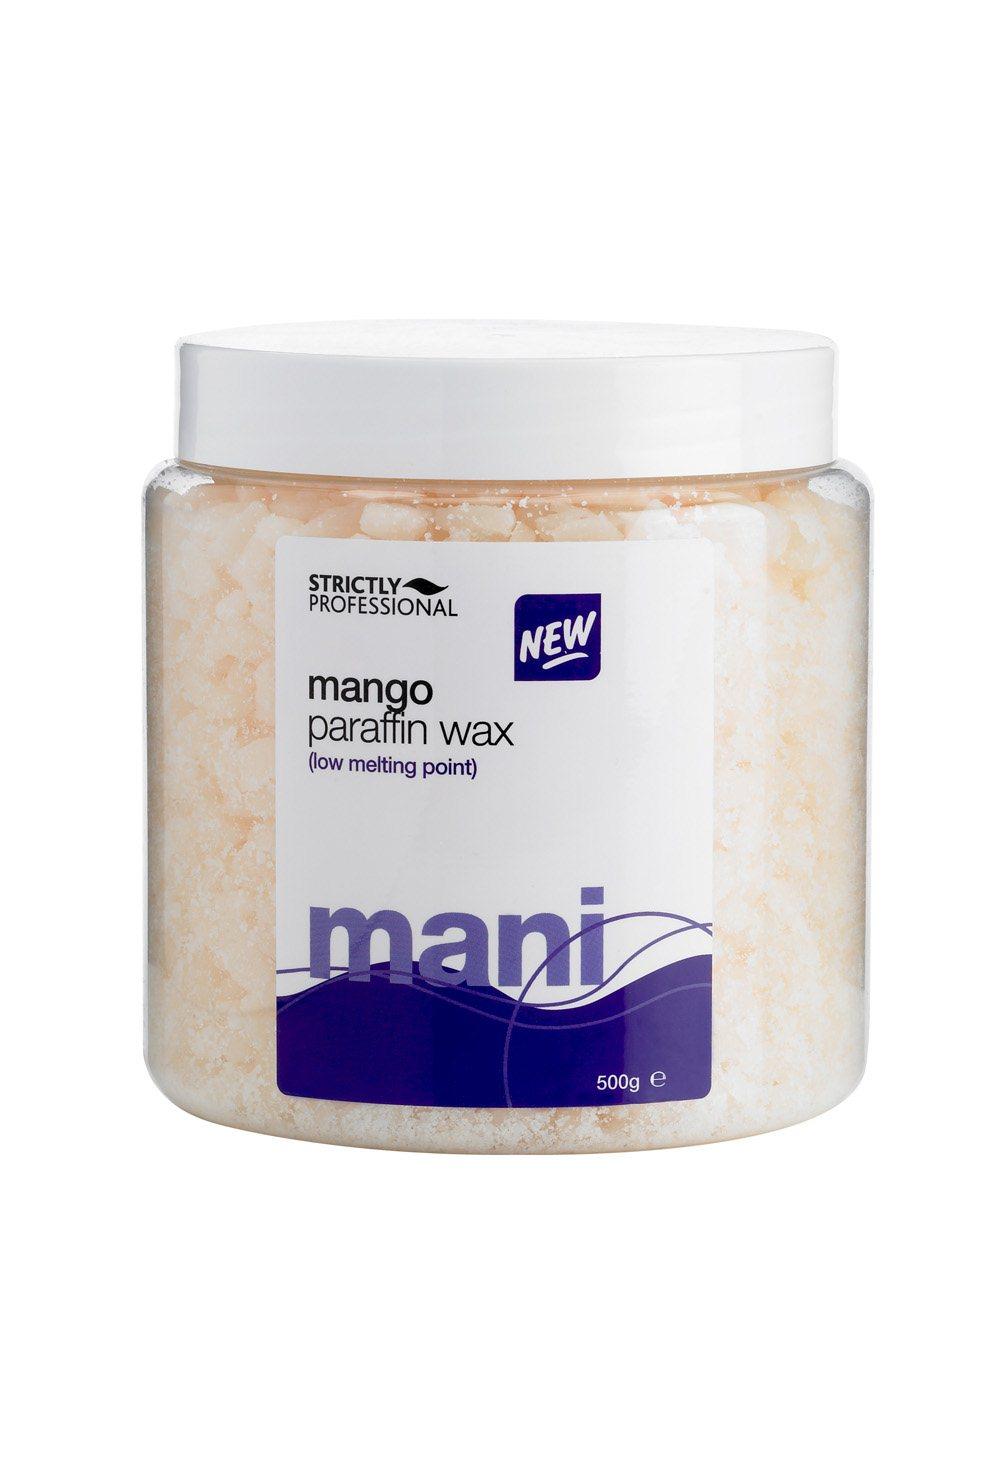 wax melting point